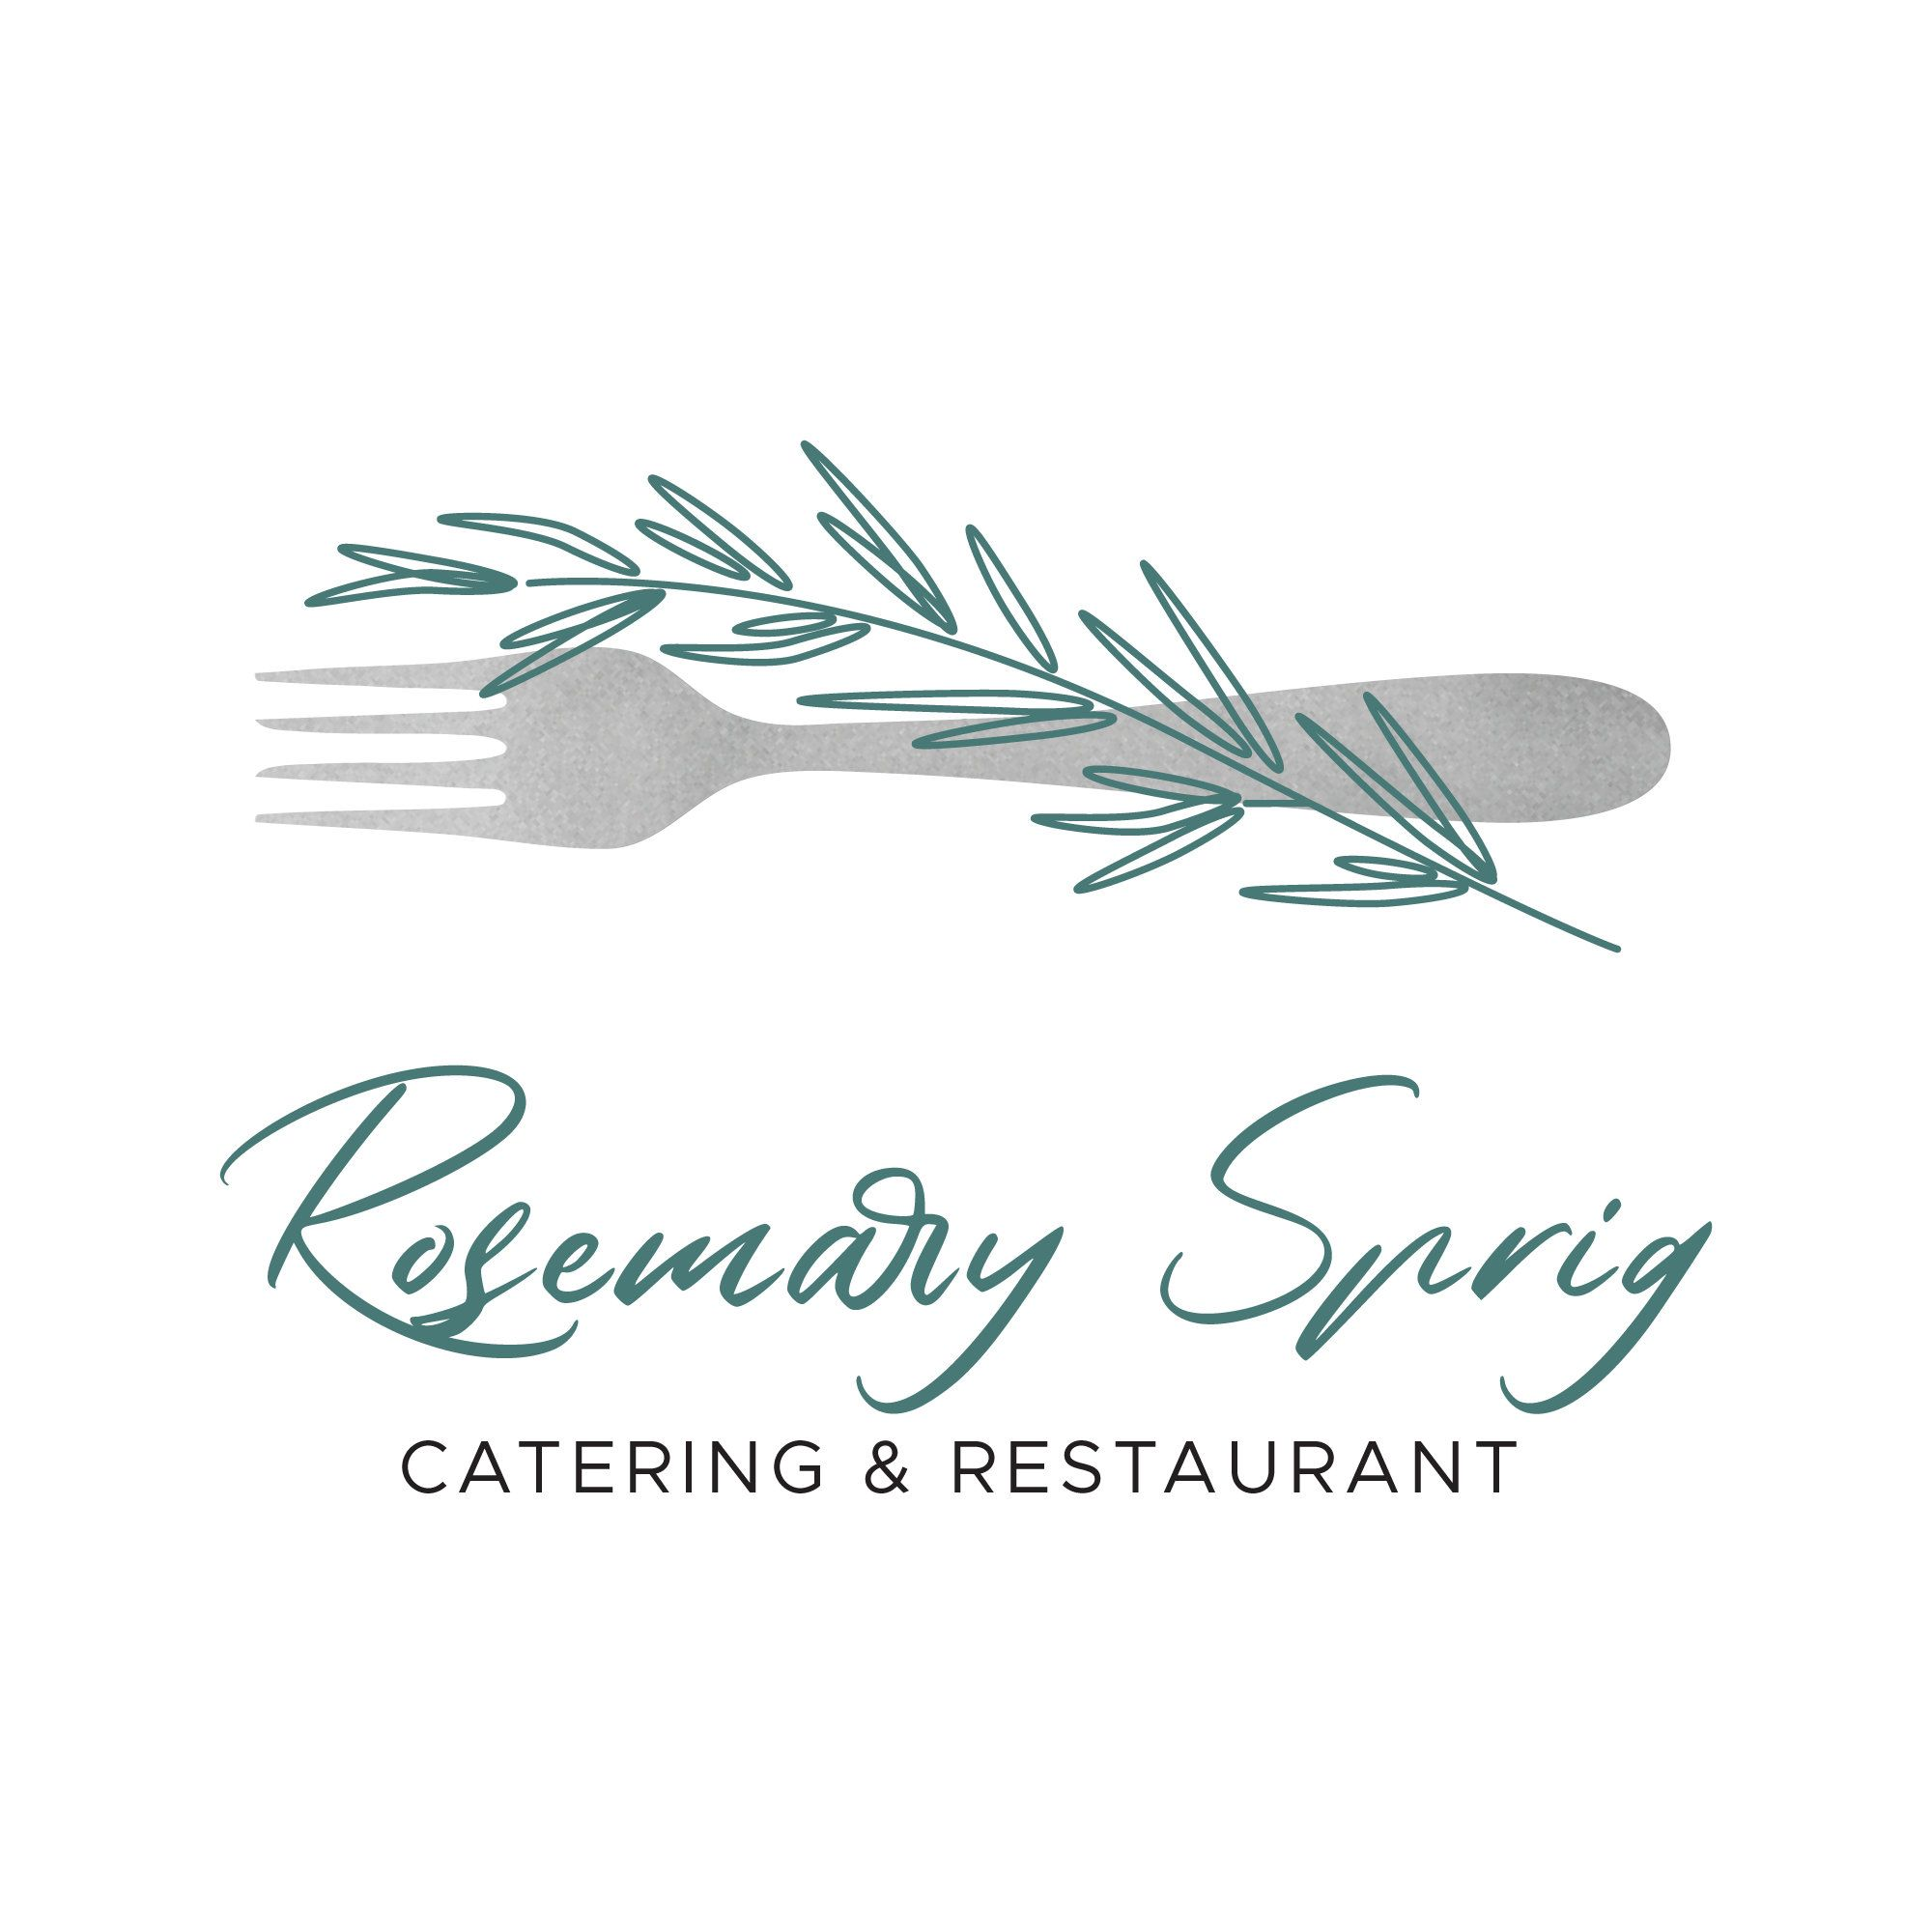 Rosemary Sprig Catering Logo Logo Design Template Instant Etsy In 2021 Catering Logo Logo Diy Cafe Logo Design